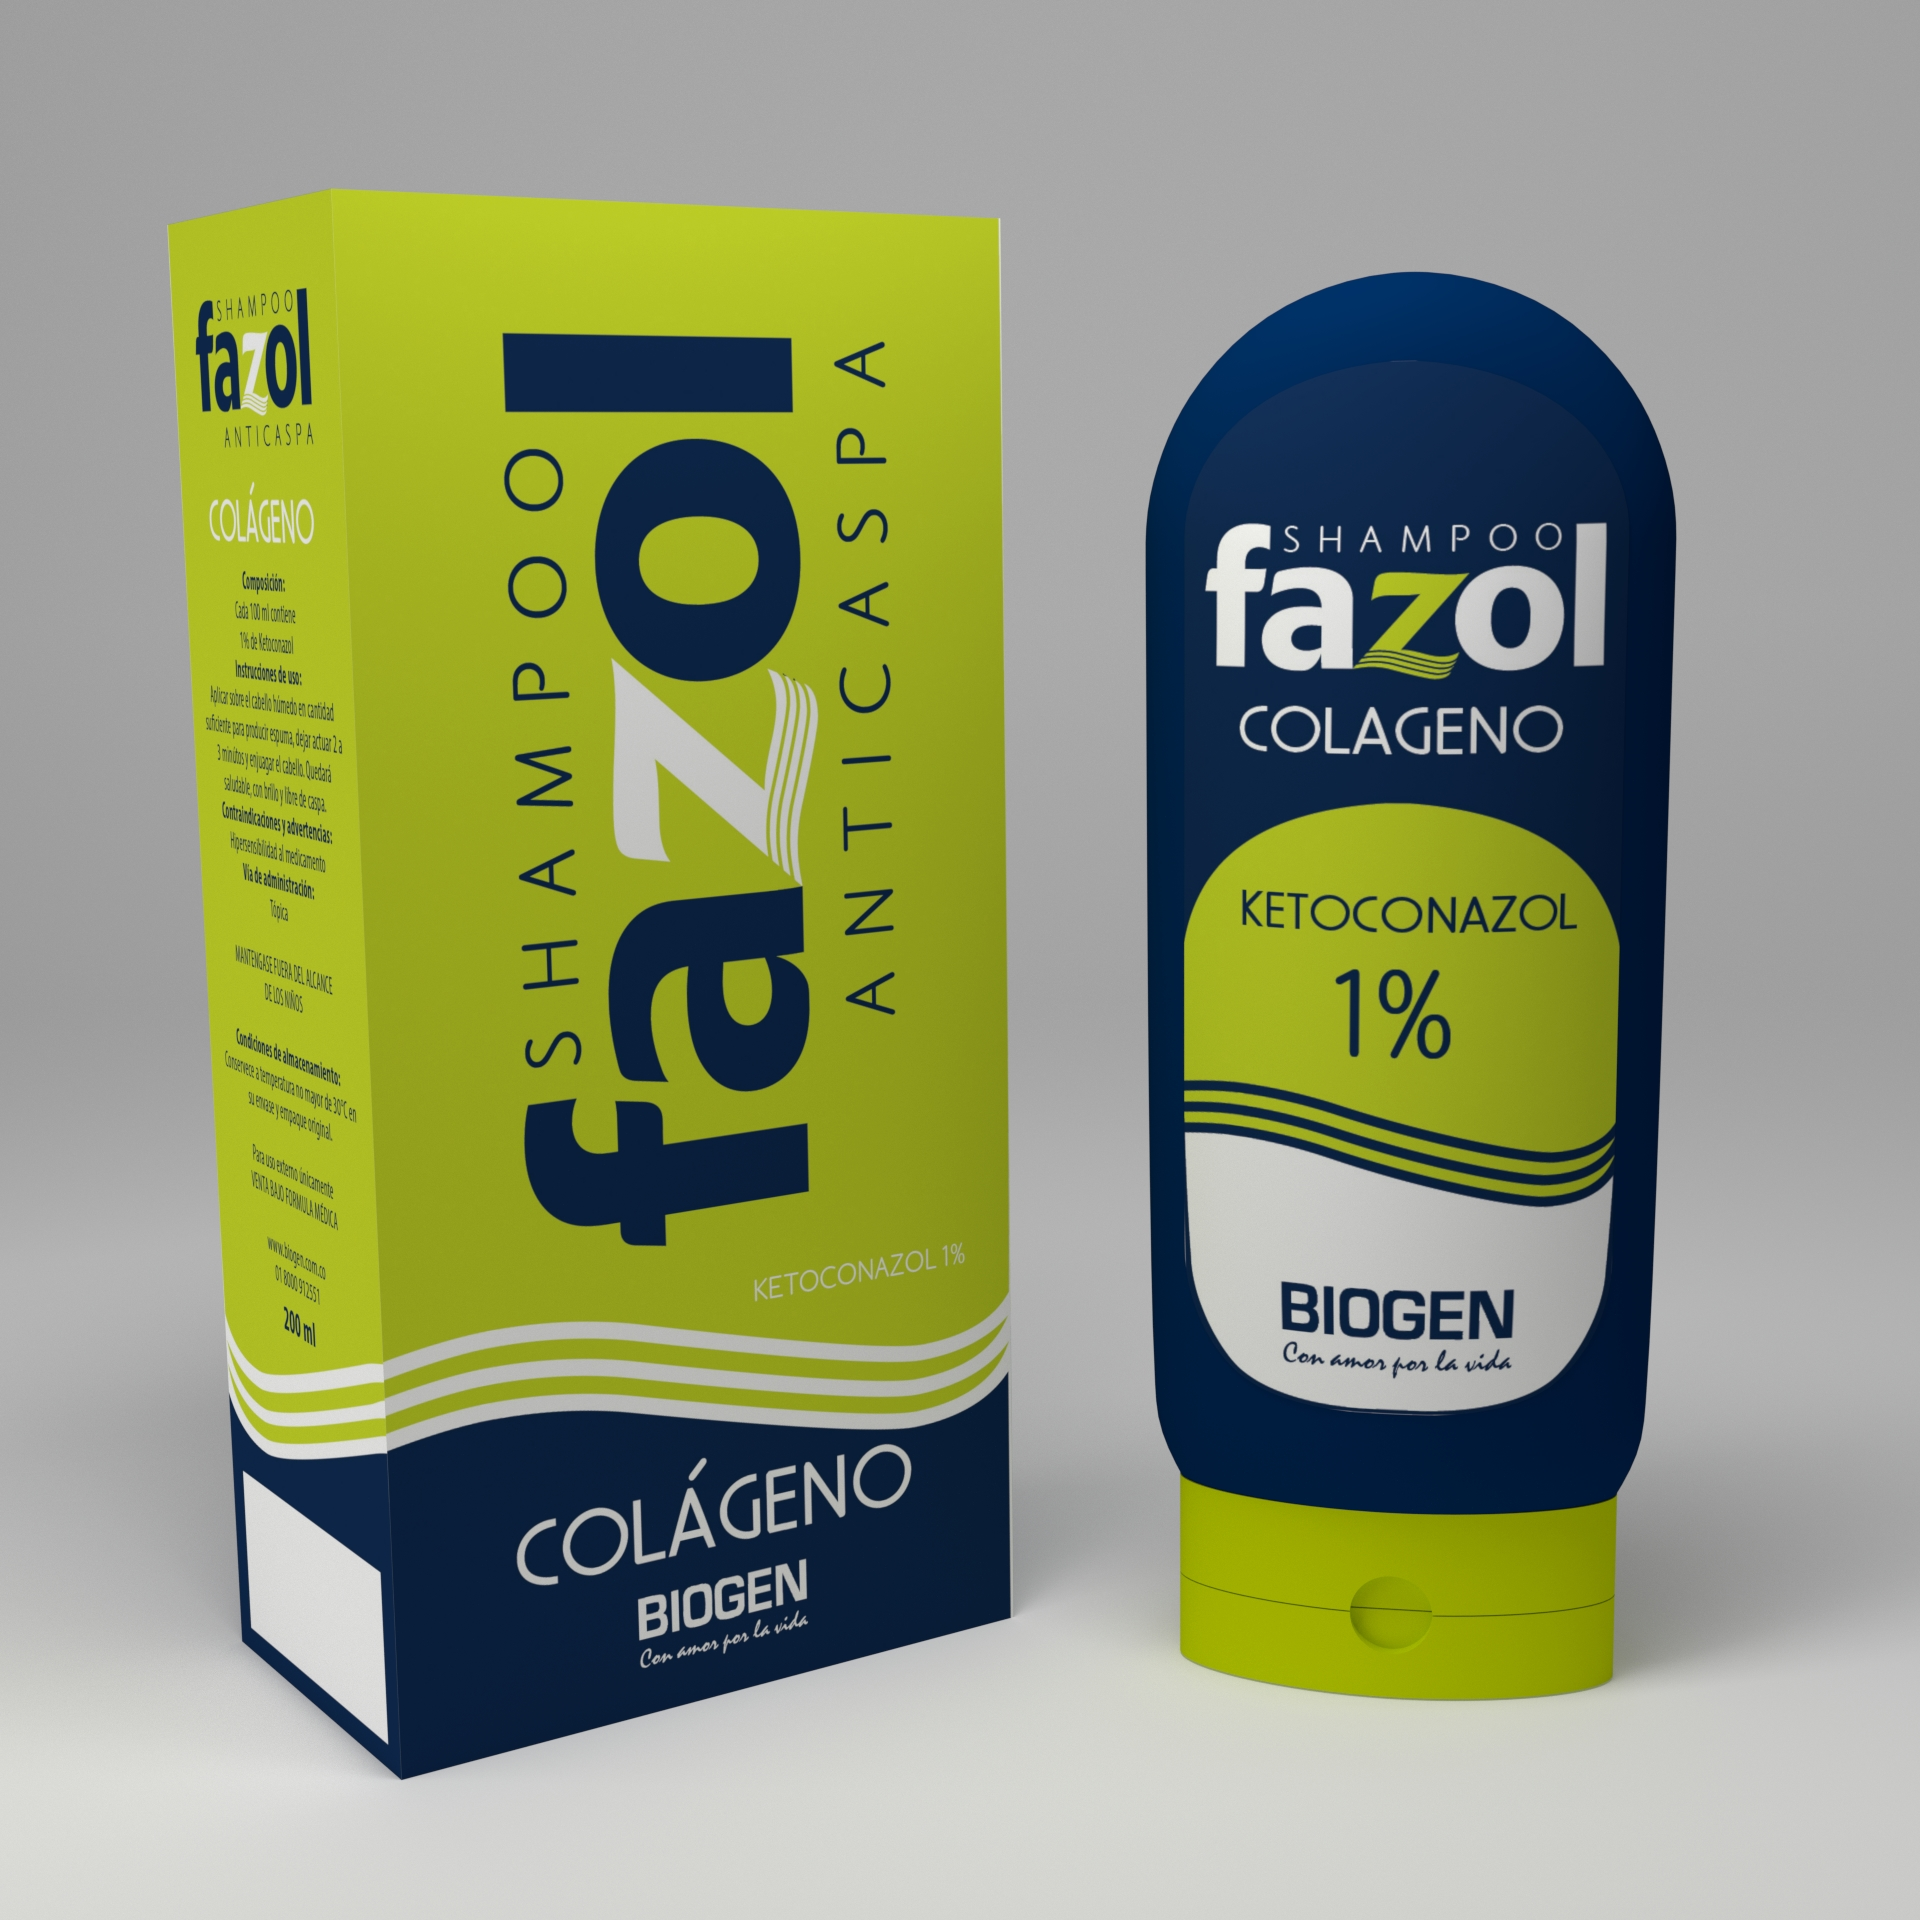 Diseño Caja y Etiqueta para shampoo anticaspa Fazol